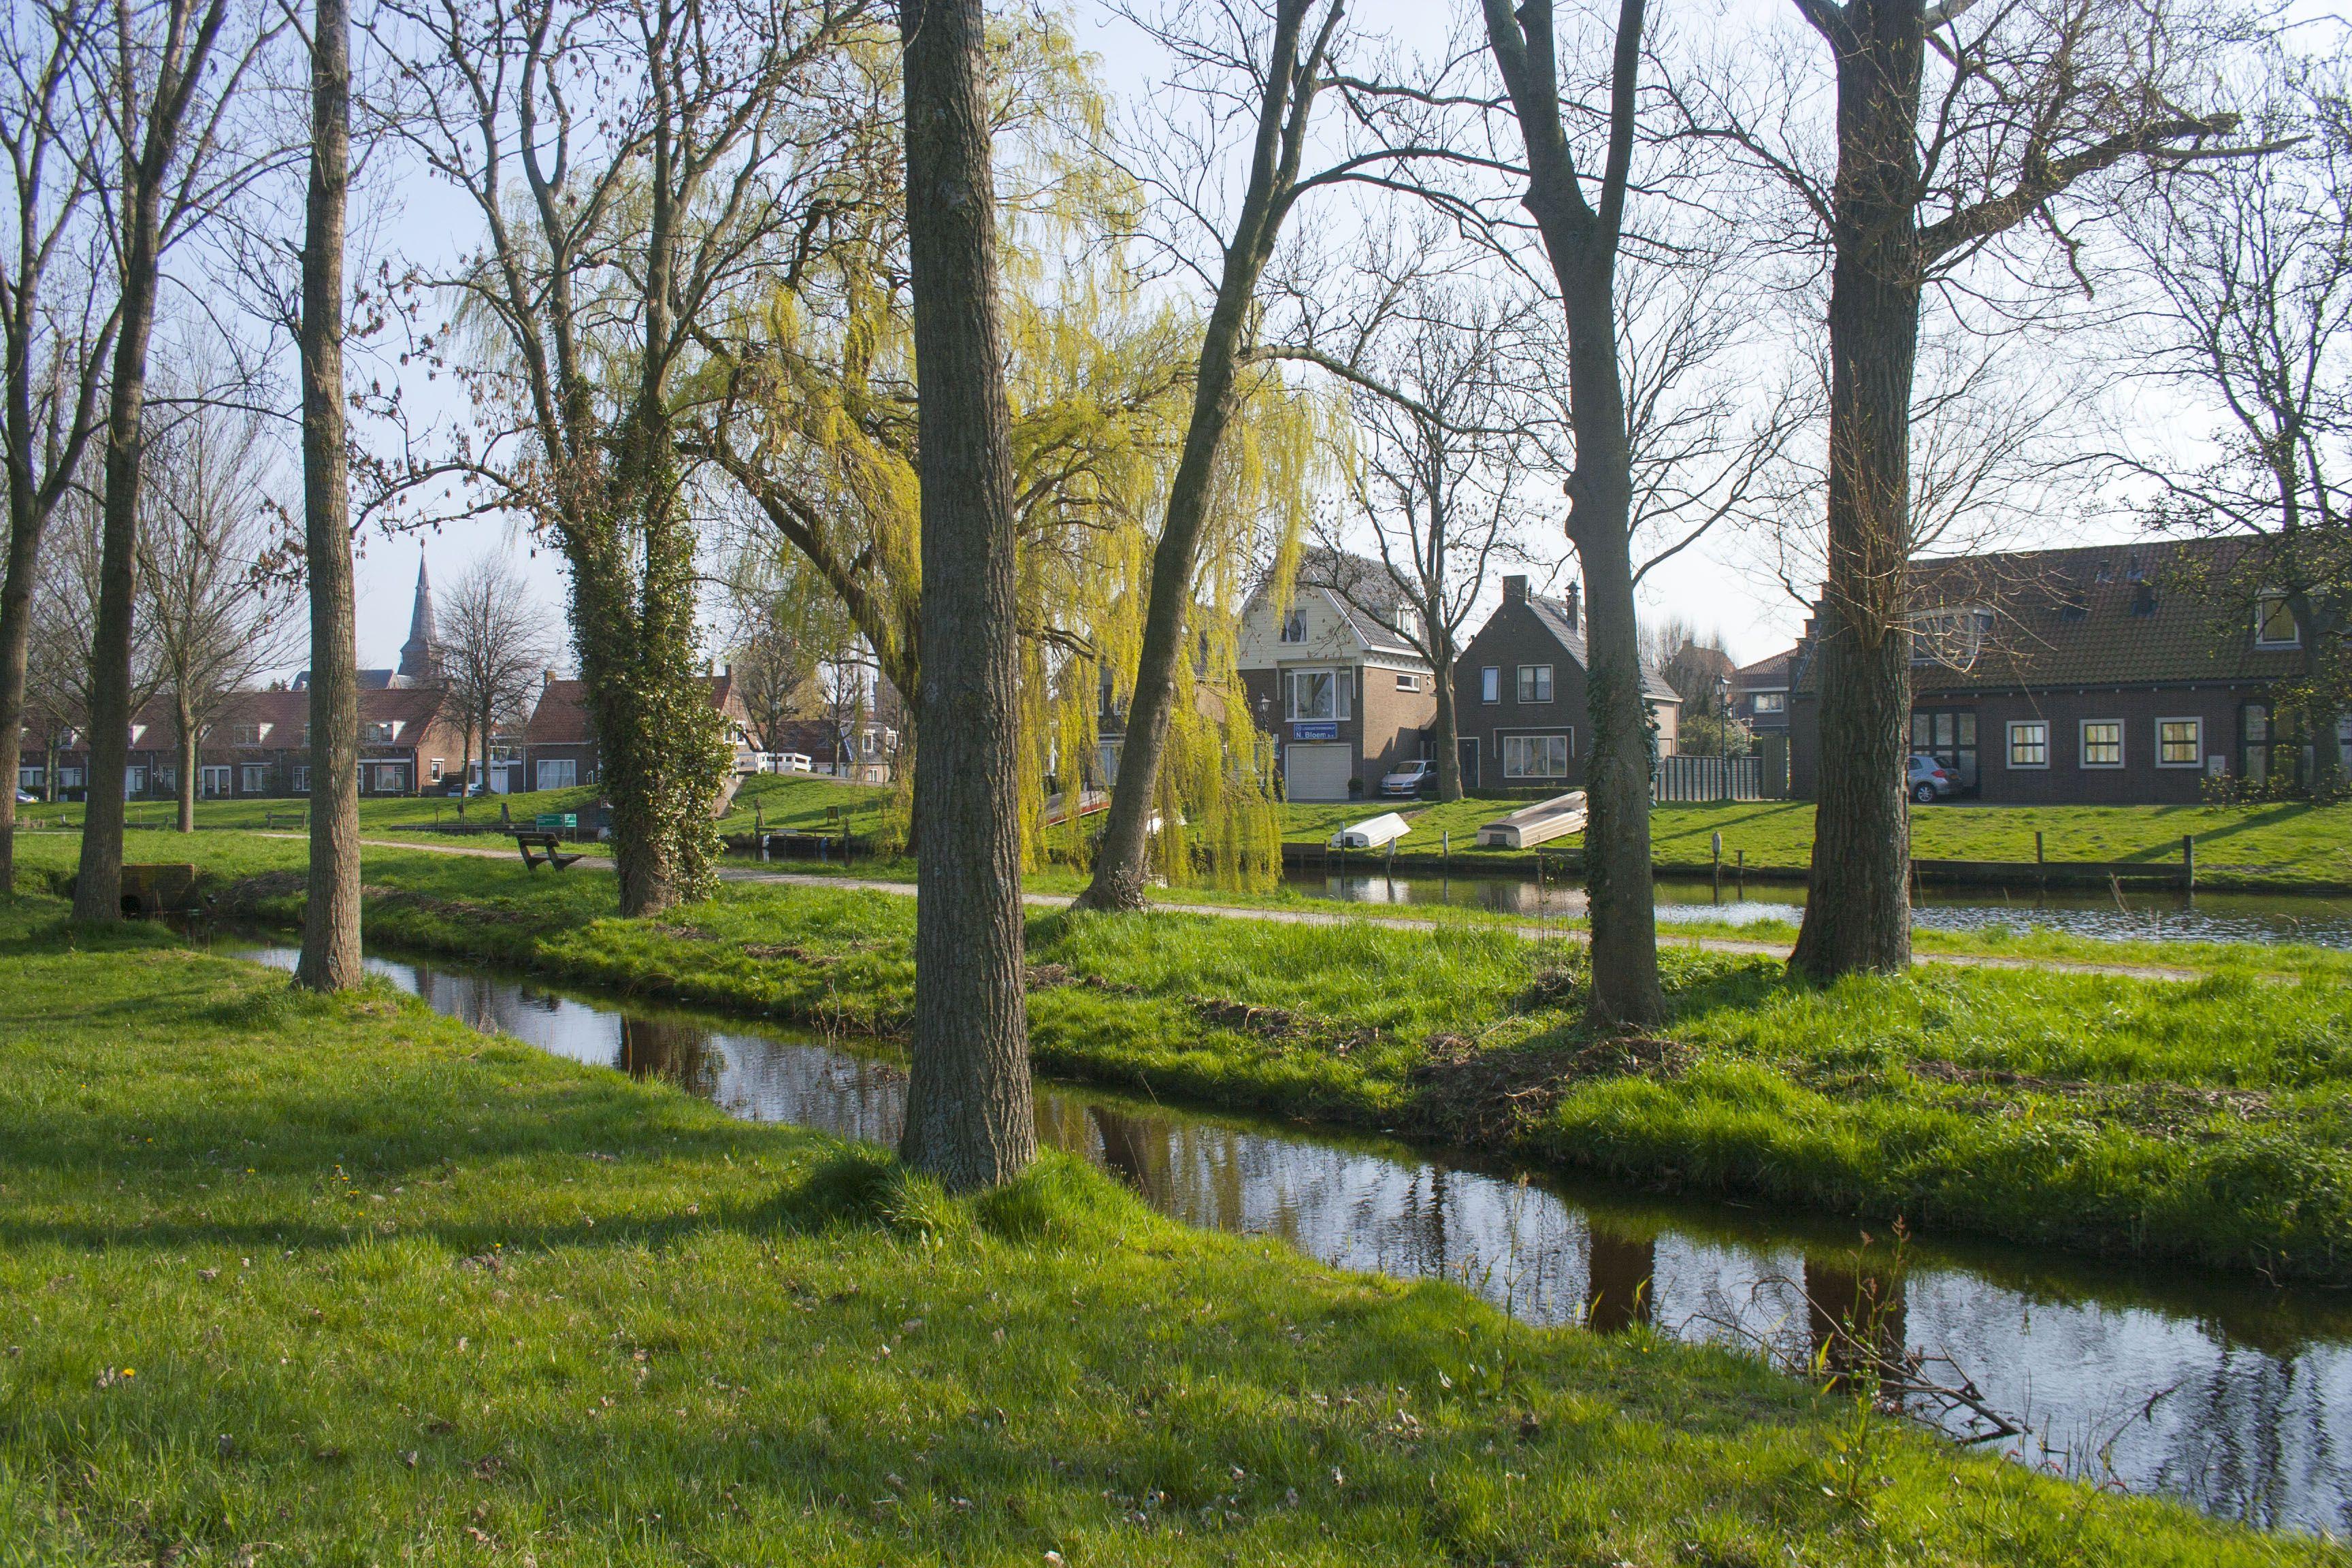 Entrada a Monnickendam, Holanda, Paises Bajos